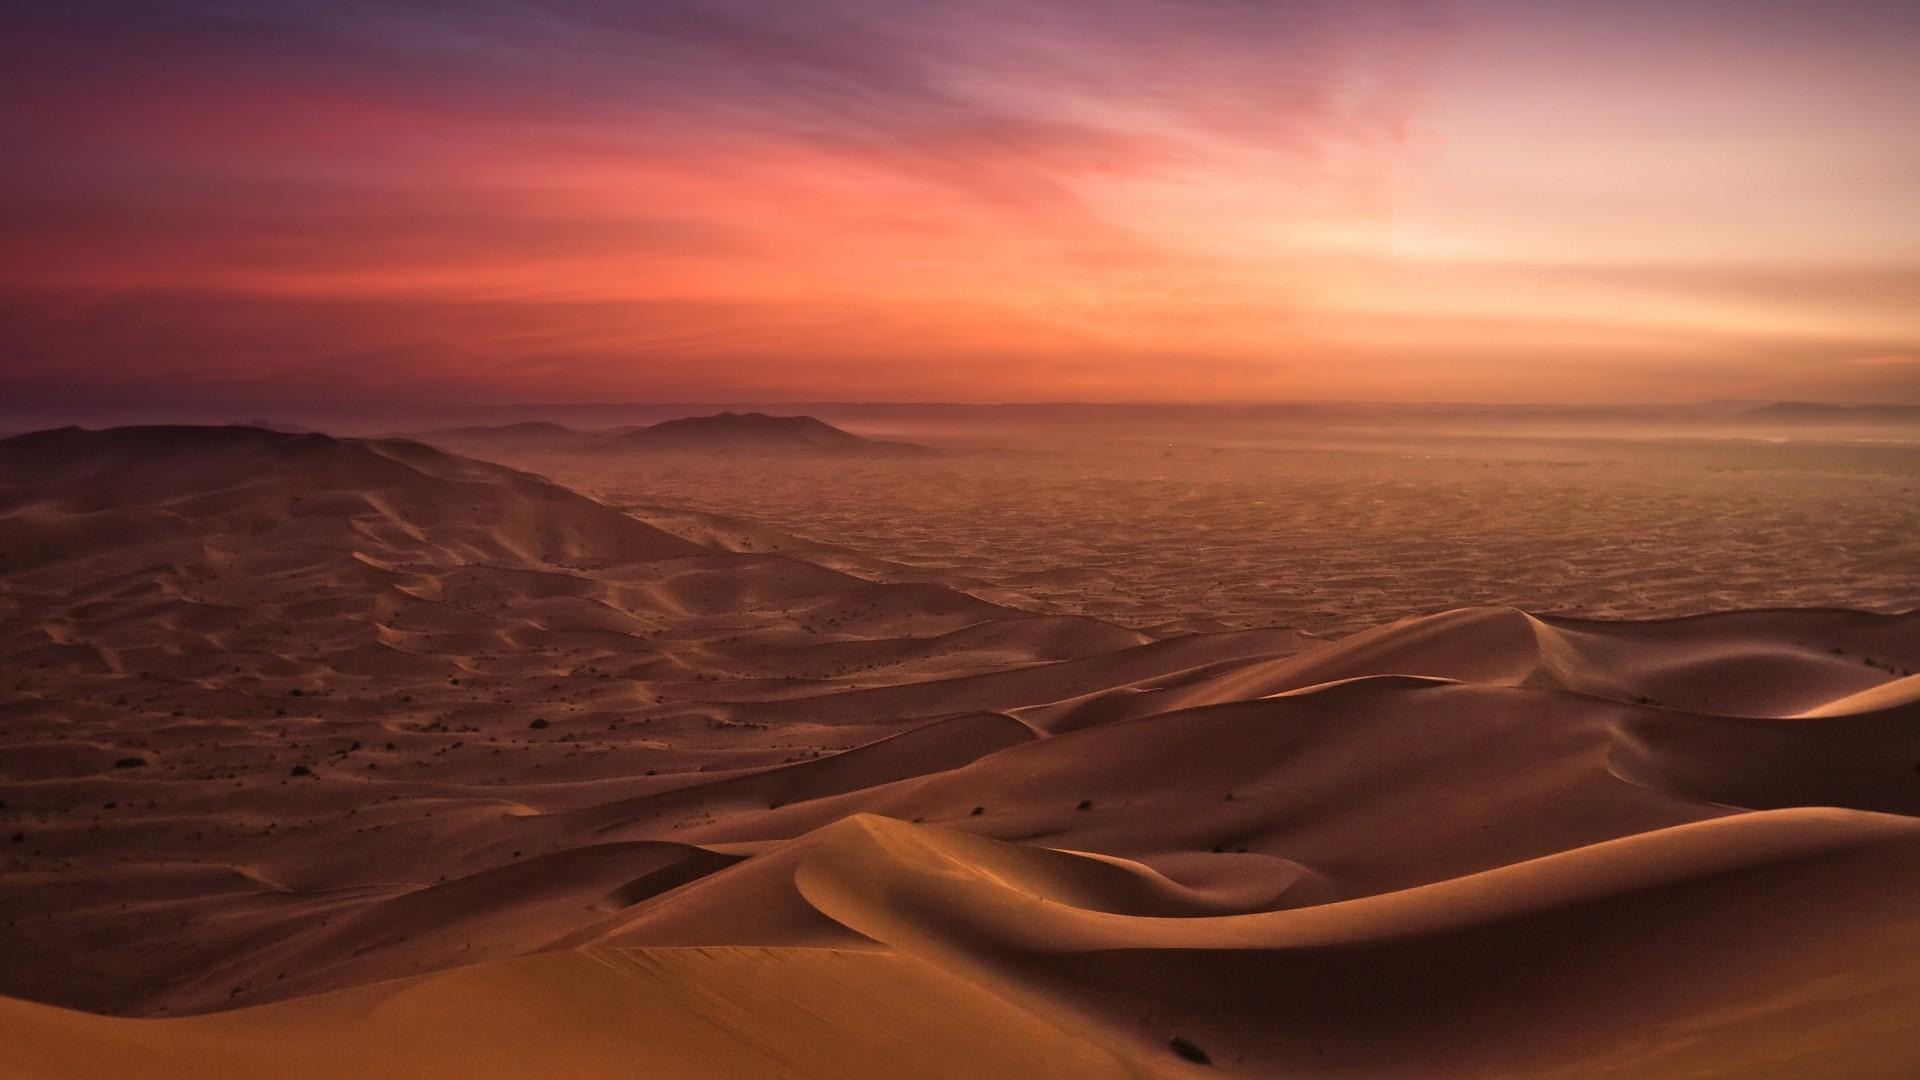 Spectacular Desert Scape Hd Desktop Background HD wallpapers